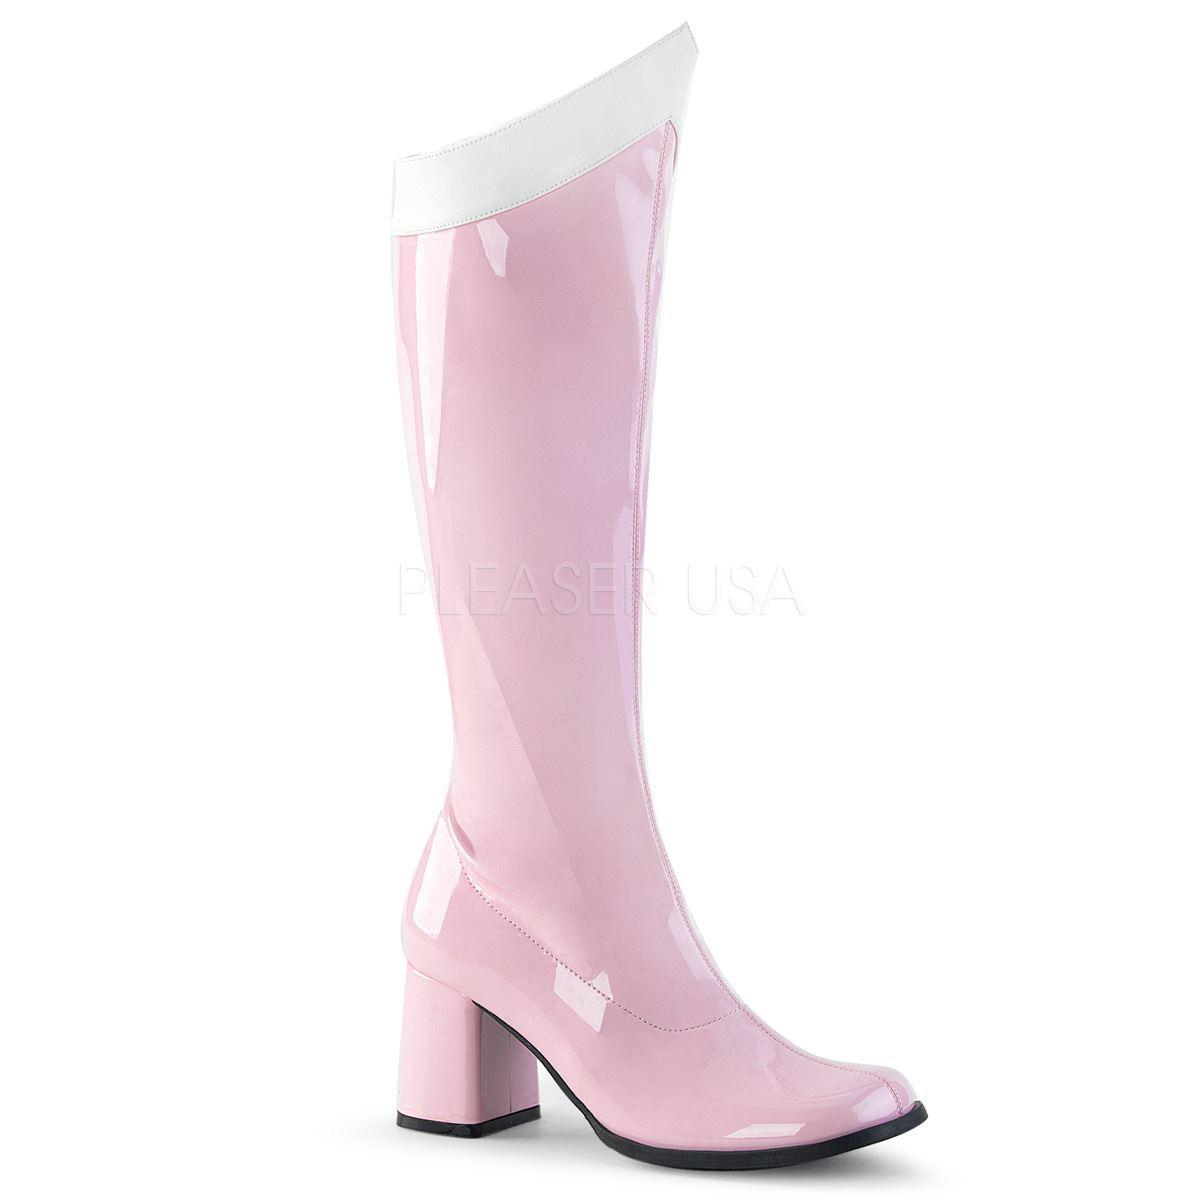 Funtasma GOGO-306 Knee High Gogo Boot Women's Baby Pink-White Stretch Pat